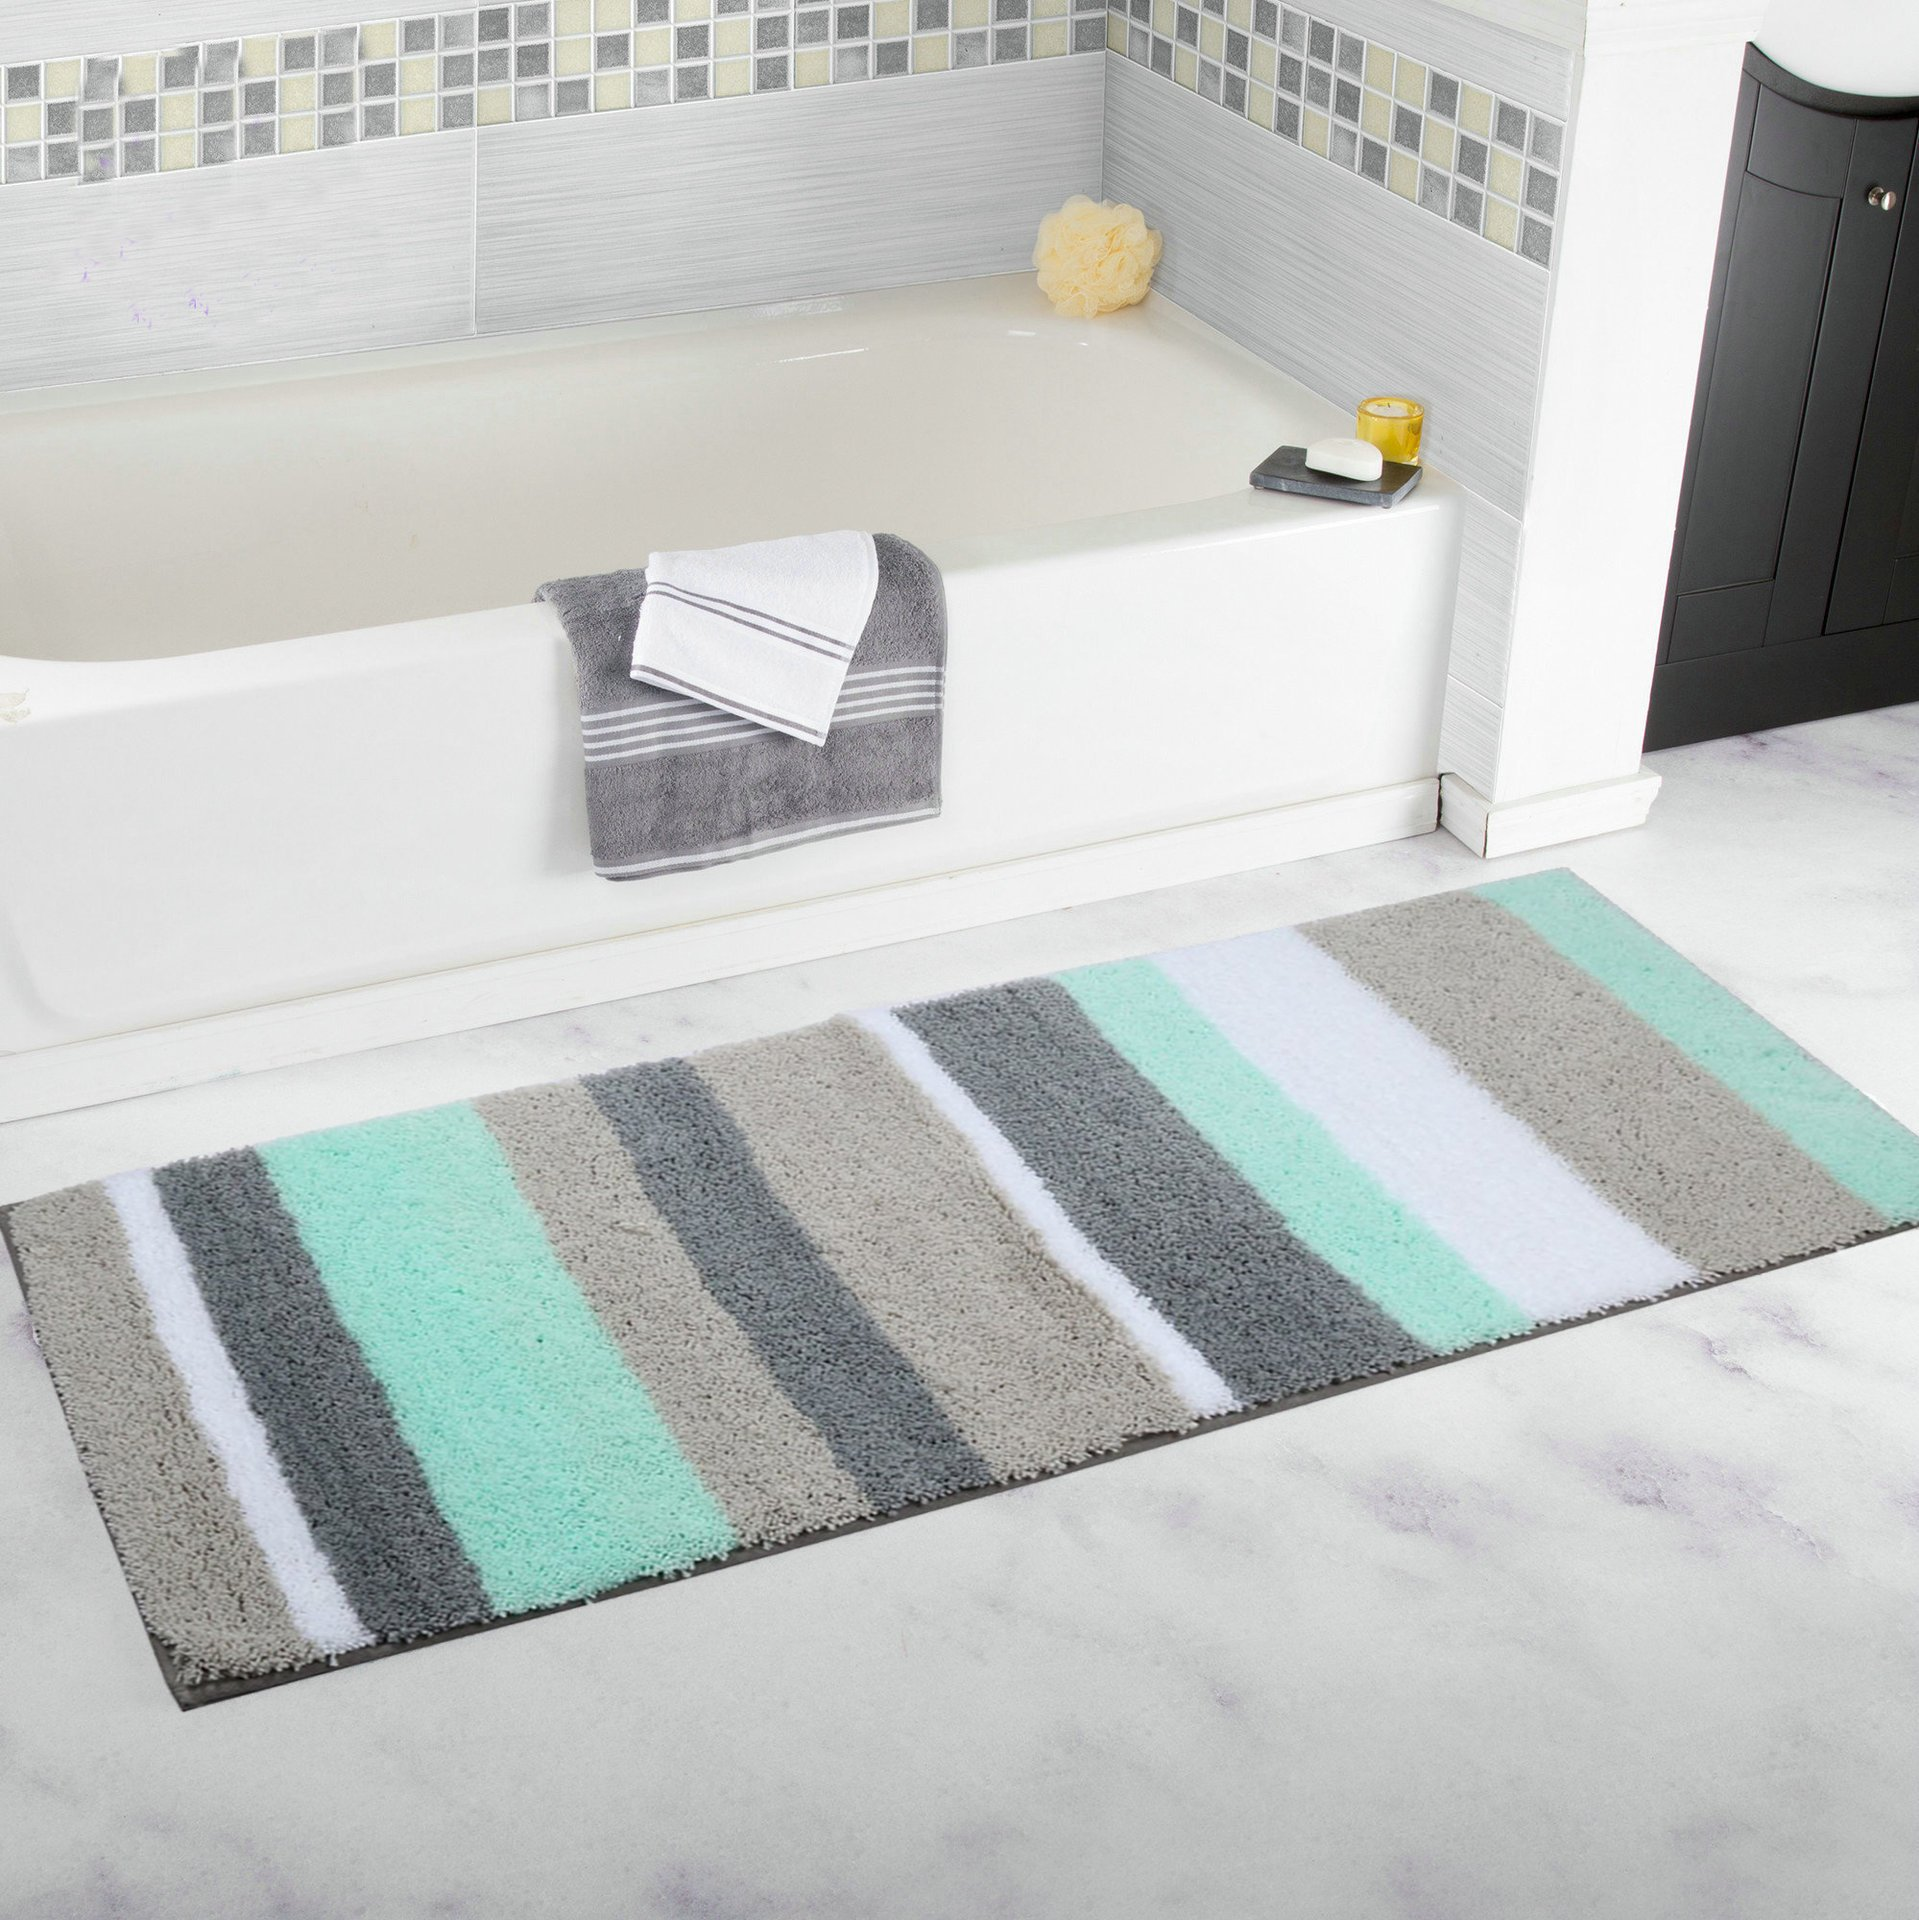 Cheap Bathroom Runner Rug Find Bathroom Runner Rug Deals On Line At Alibaba Com